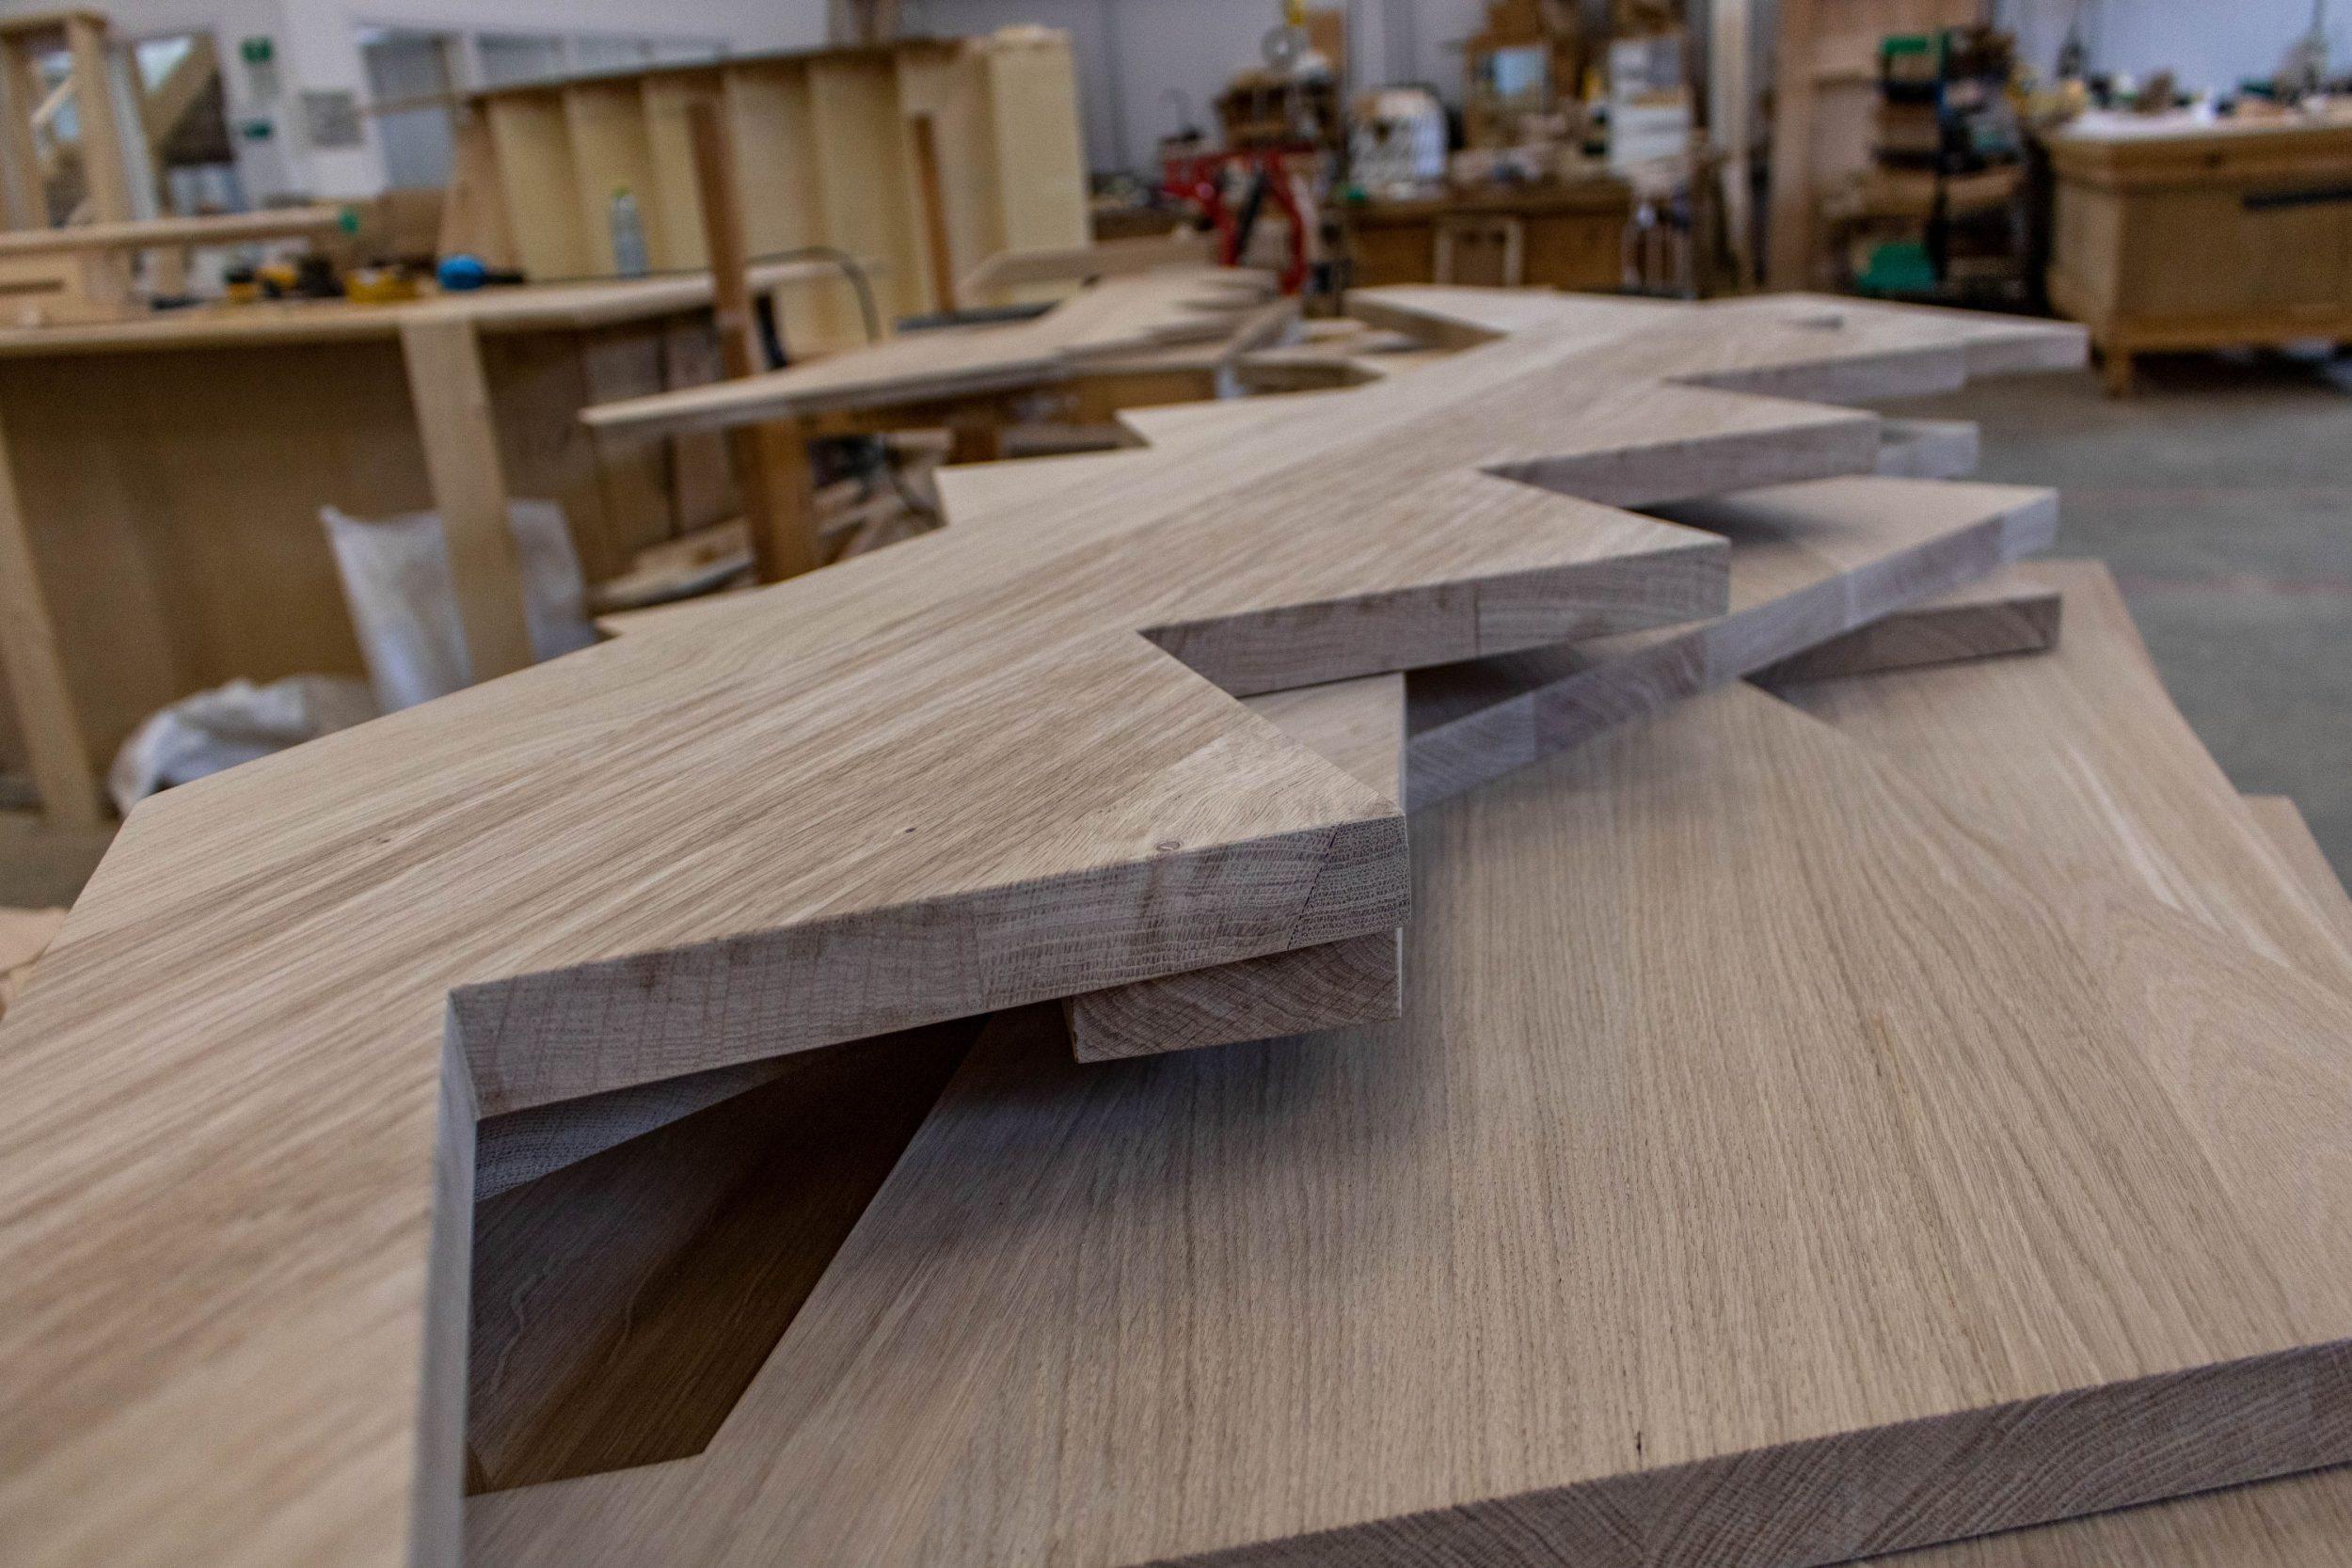 Kandd Stairs design part